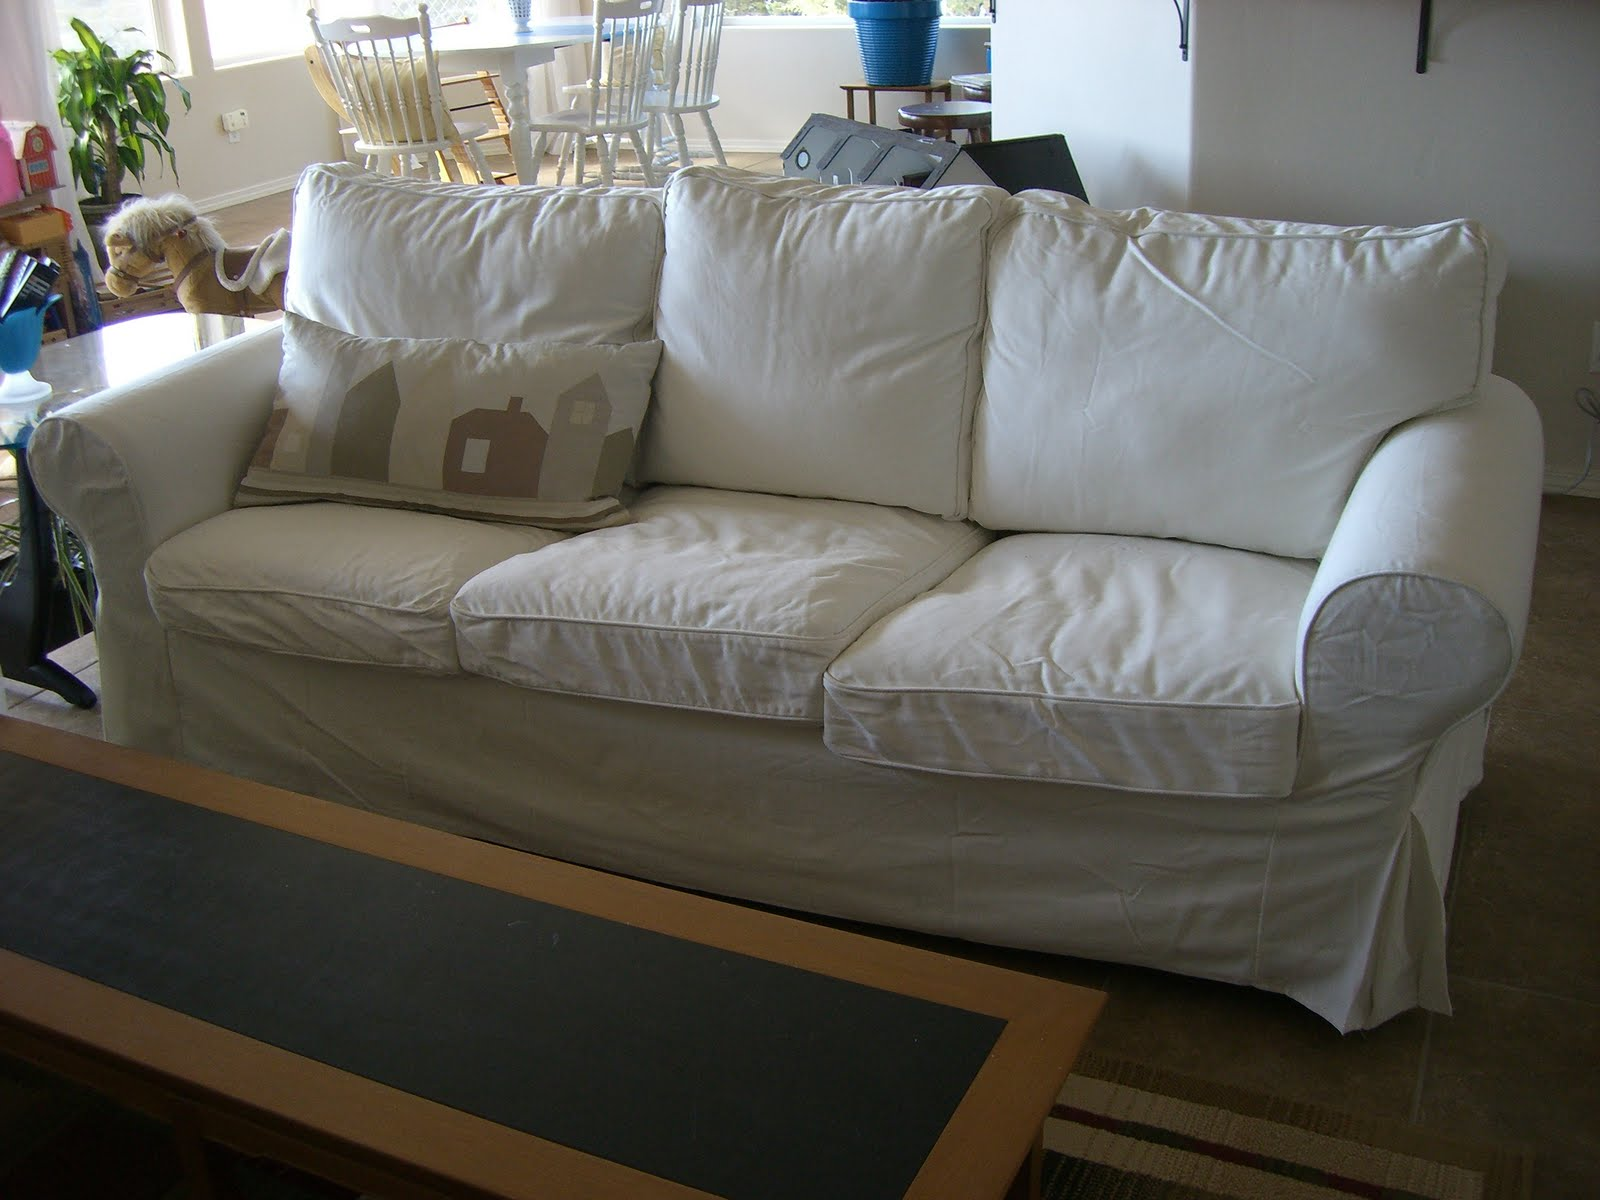 home kids life white sofas children ikea ektorp. Black Bedroom Furniture Sets. Home Design Ideas